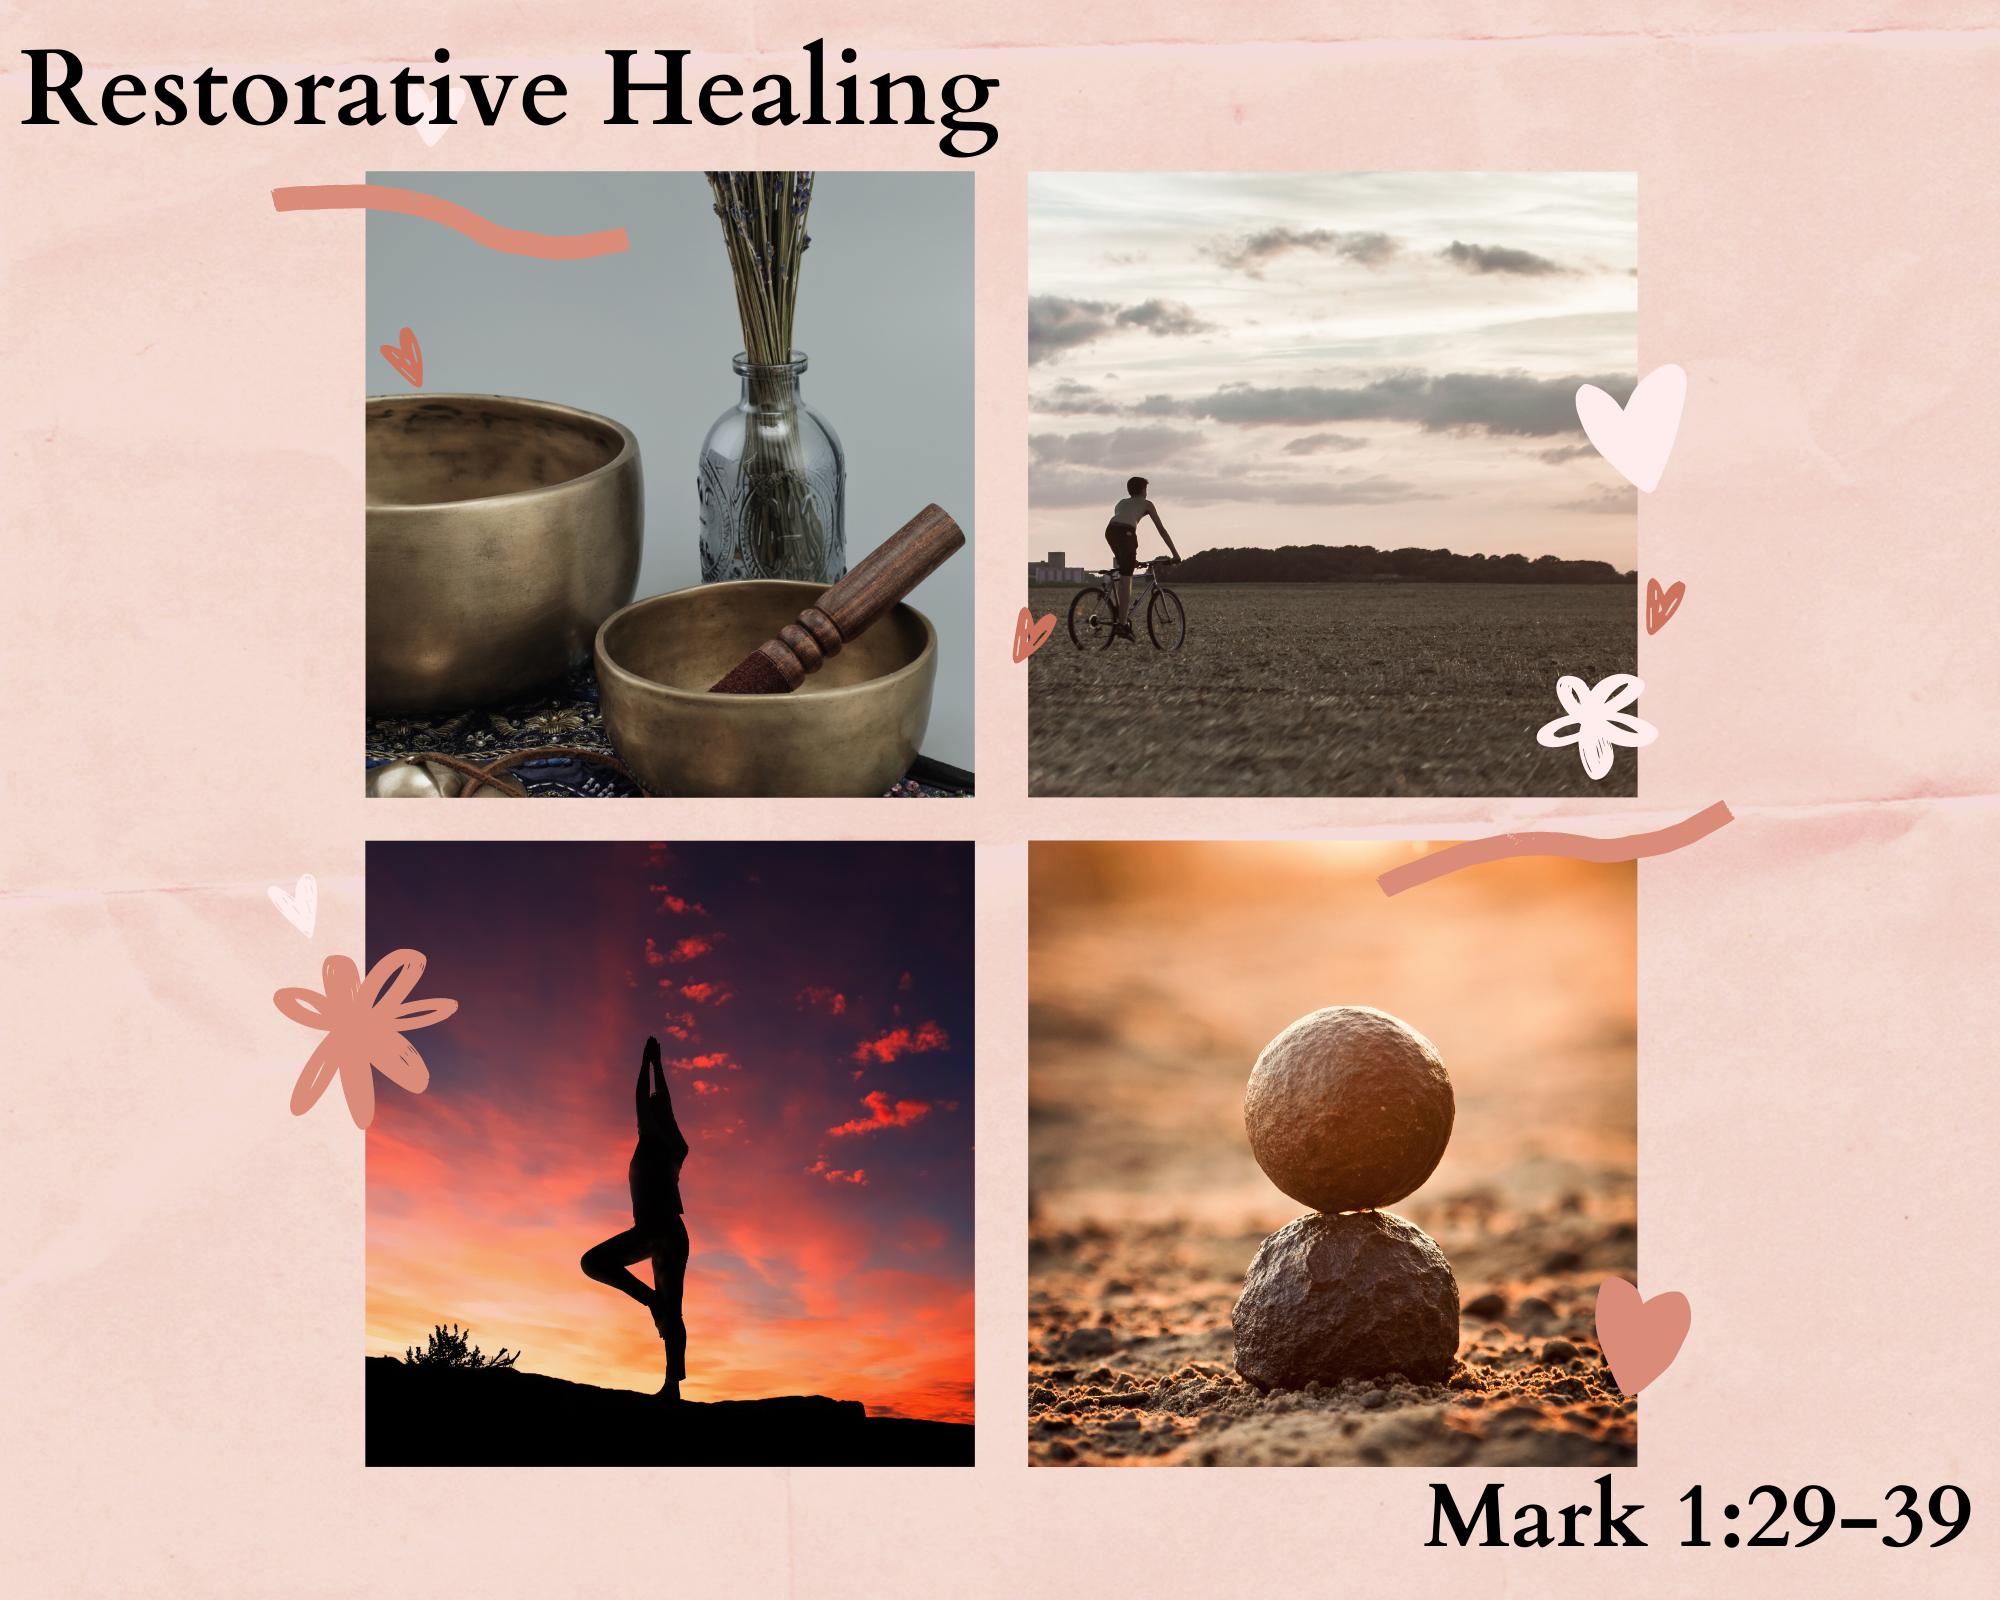 Restorative Healing 2.7.21